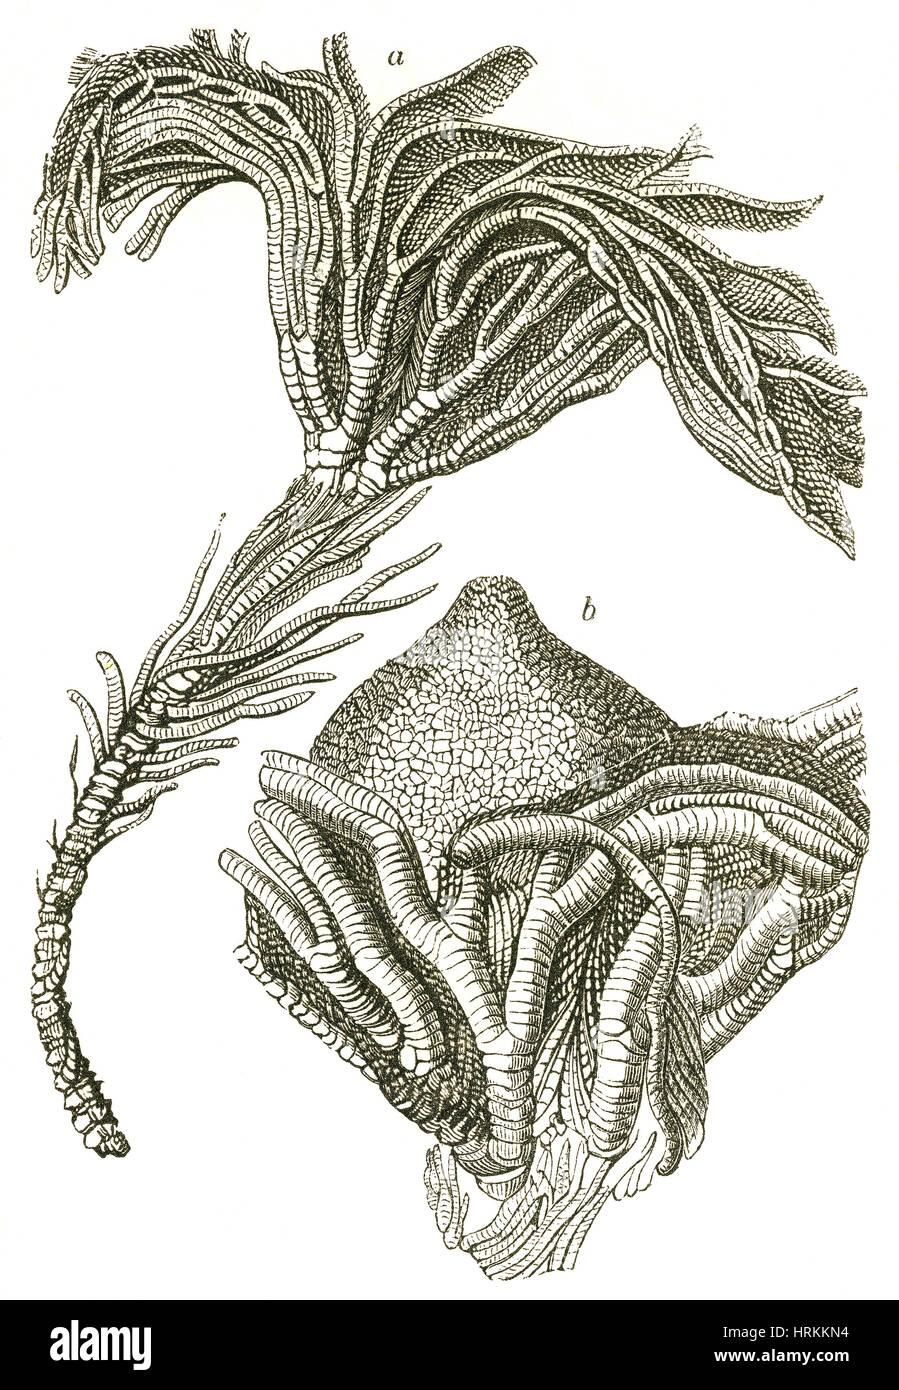 Crinoïdes fossiles Photo Stock